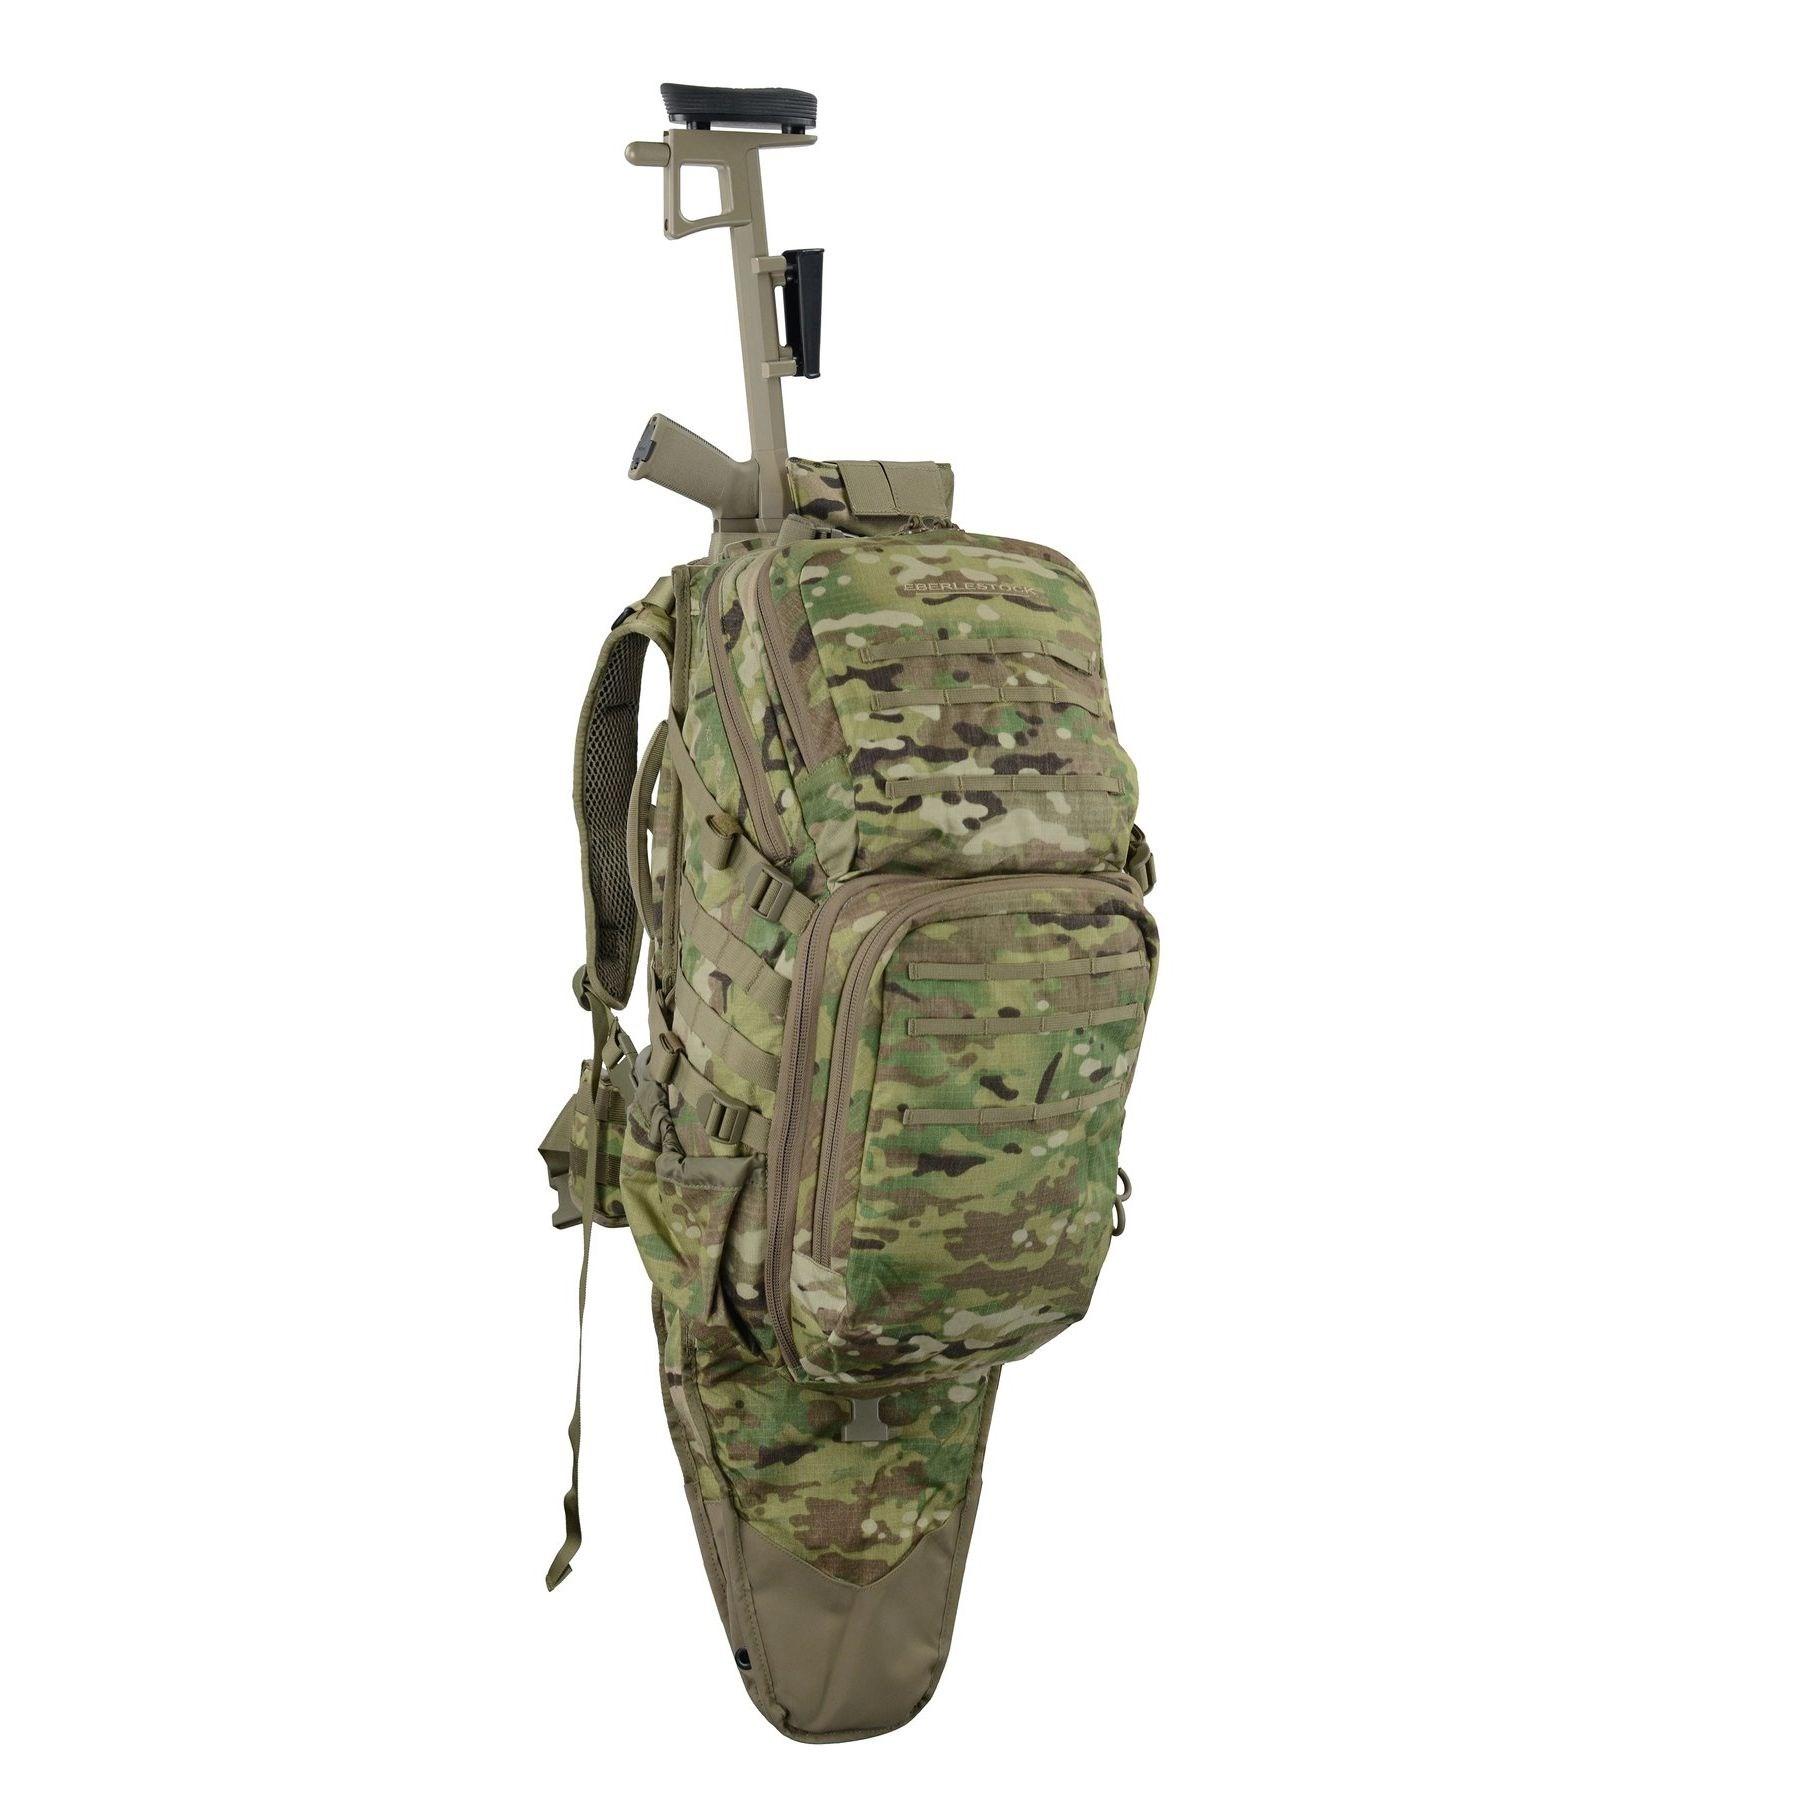 Backpack X31 LODRAG II MULTICAM EBERLESTOCK X31MM L-11